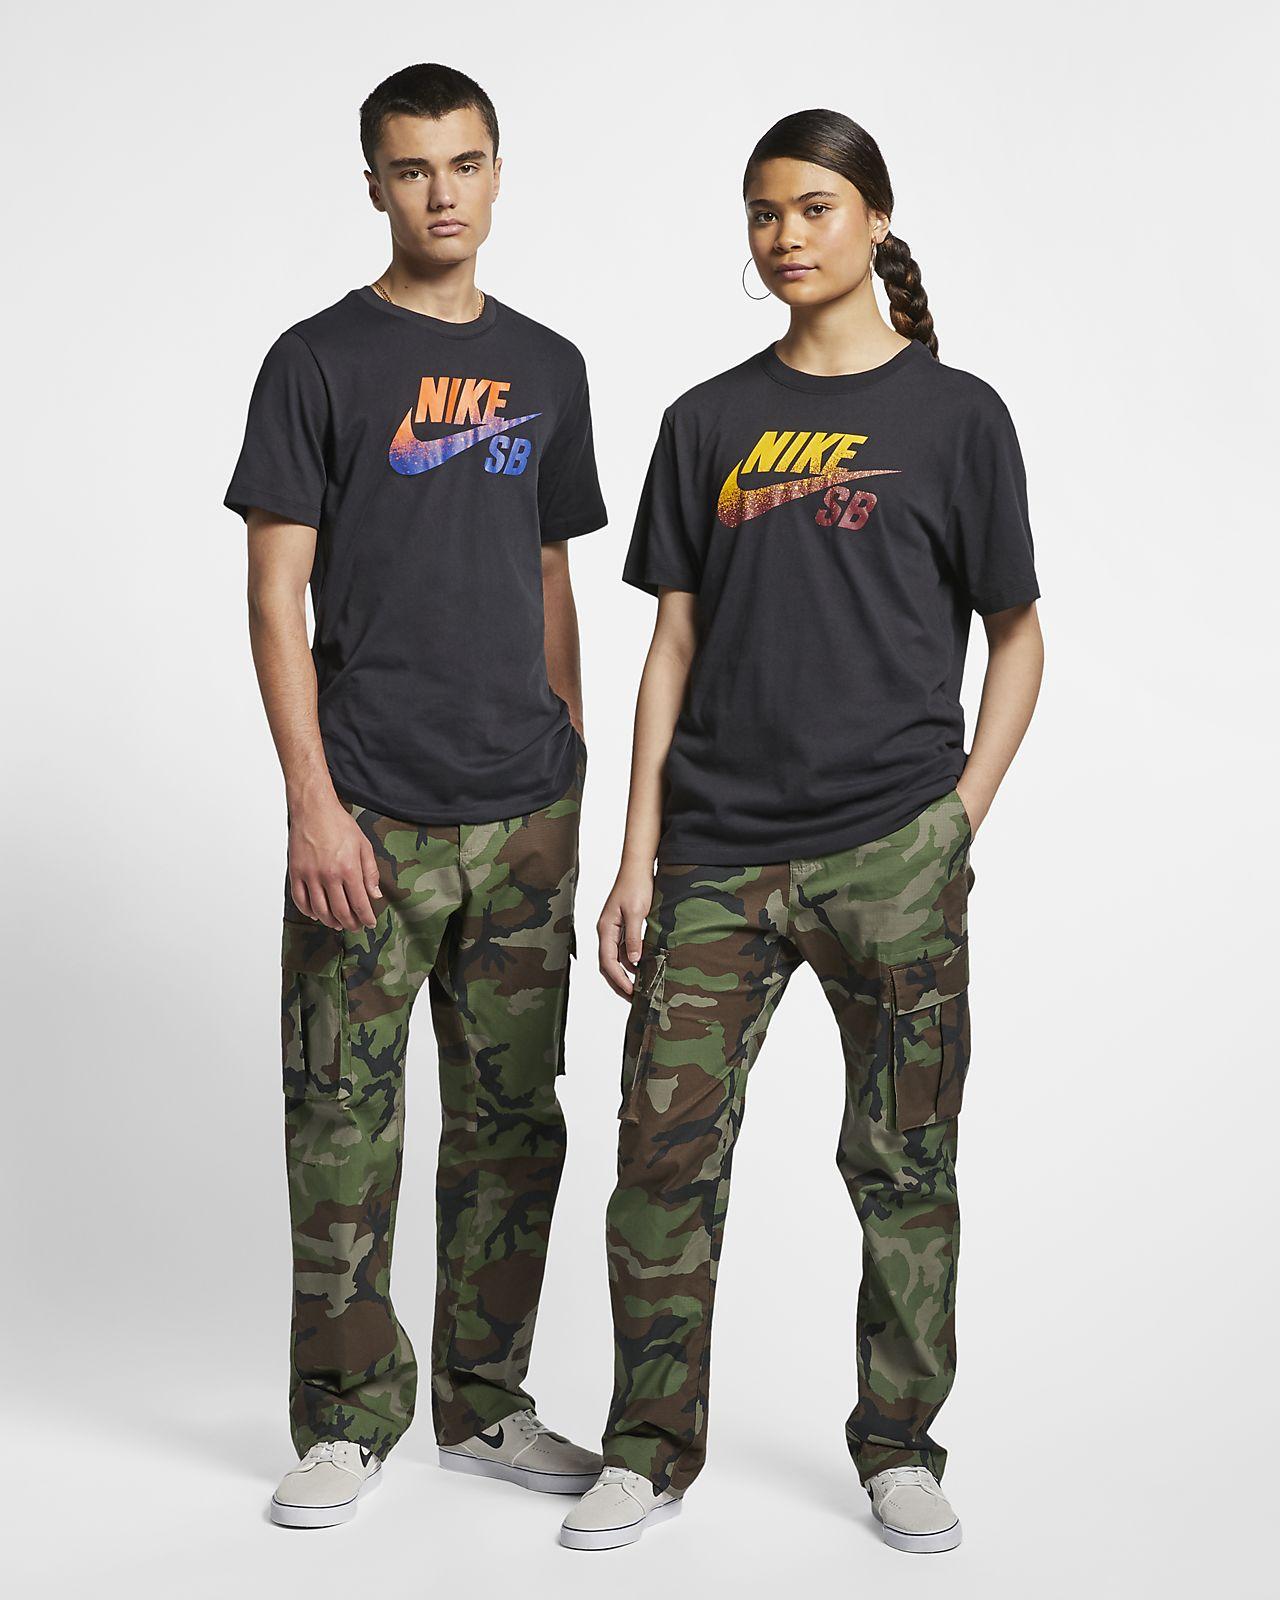 716829dbb04180 promo code for nike sb flex mens cargo trousers 26536 7cc34